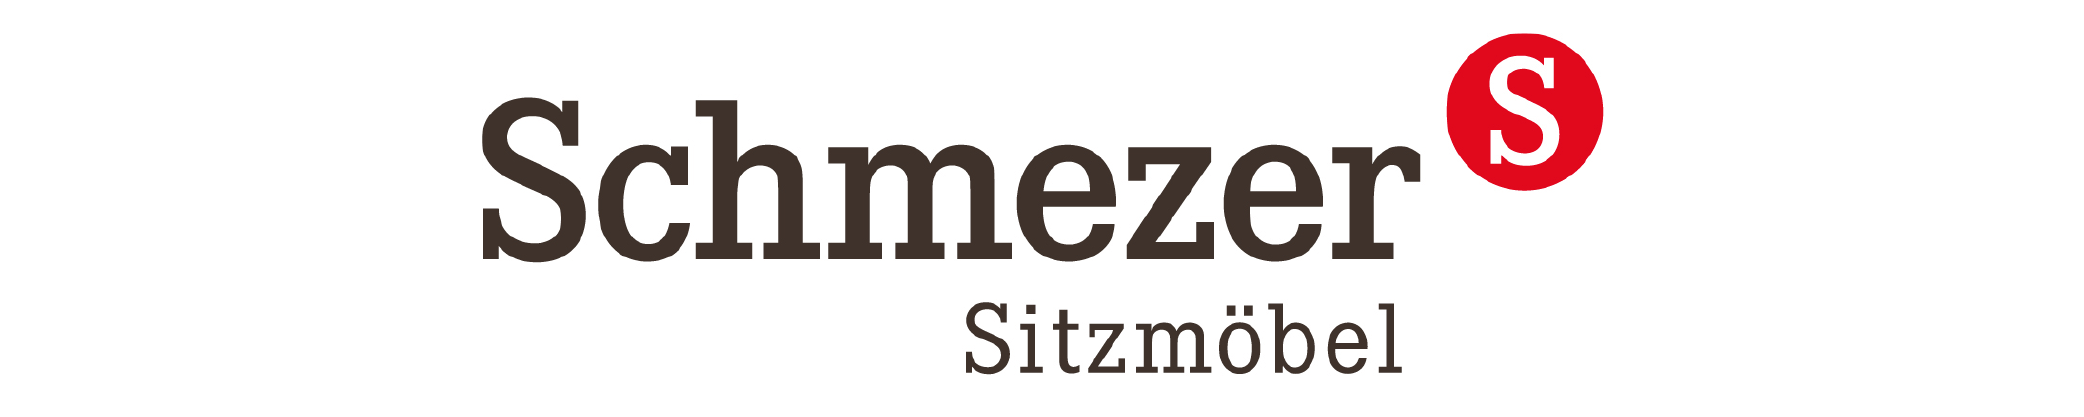 SCHMEZER